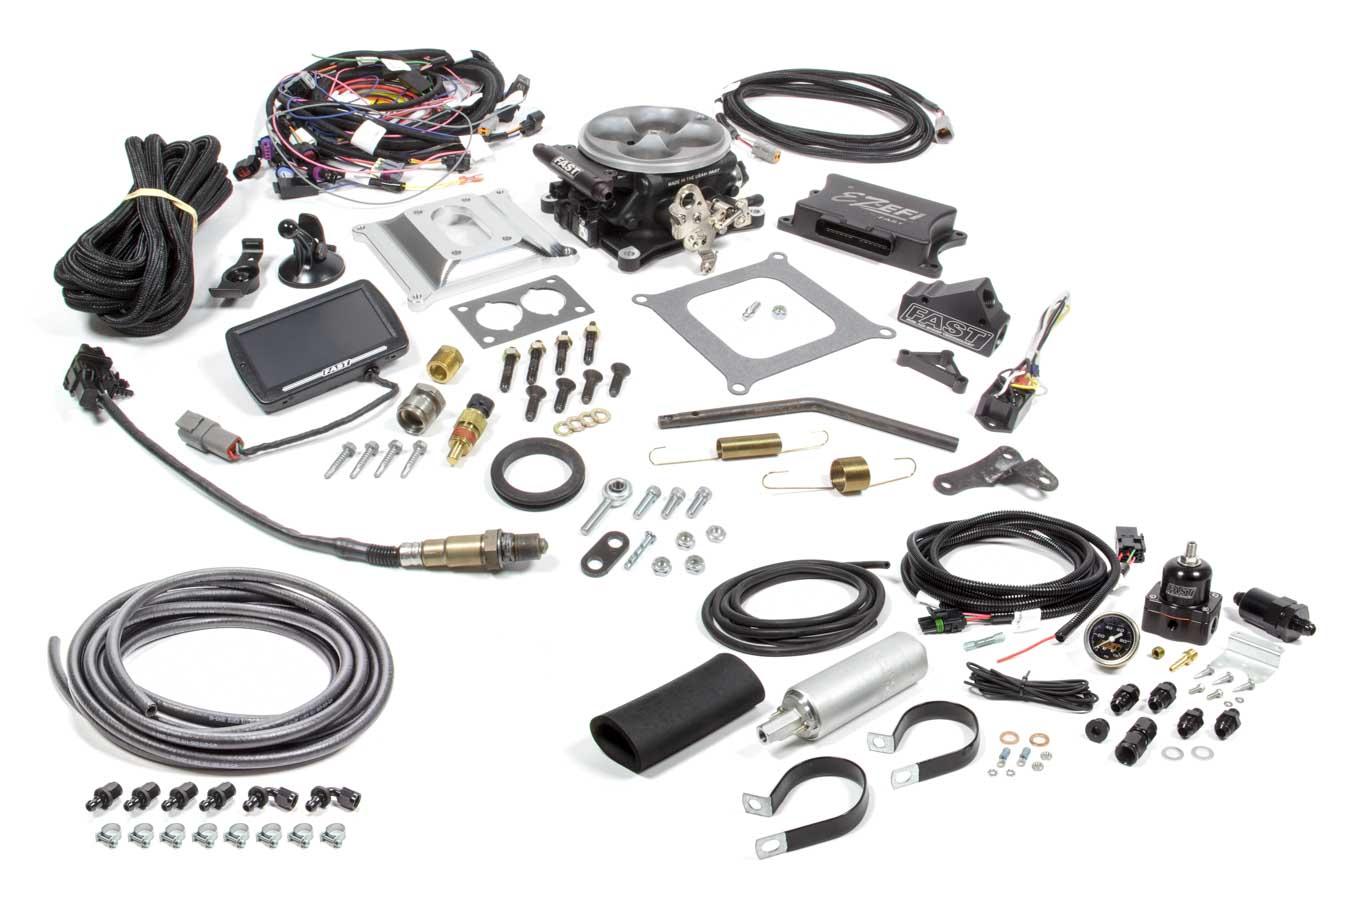 Fast Electronics Jeep Inline 6 Master Ez Efi Fuel